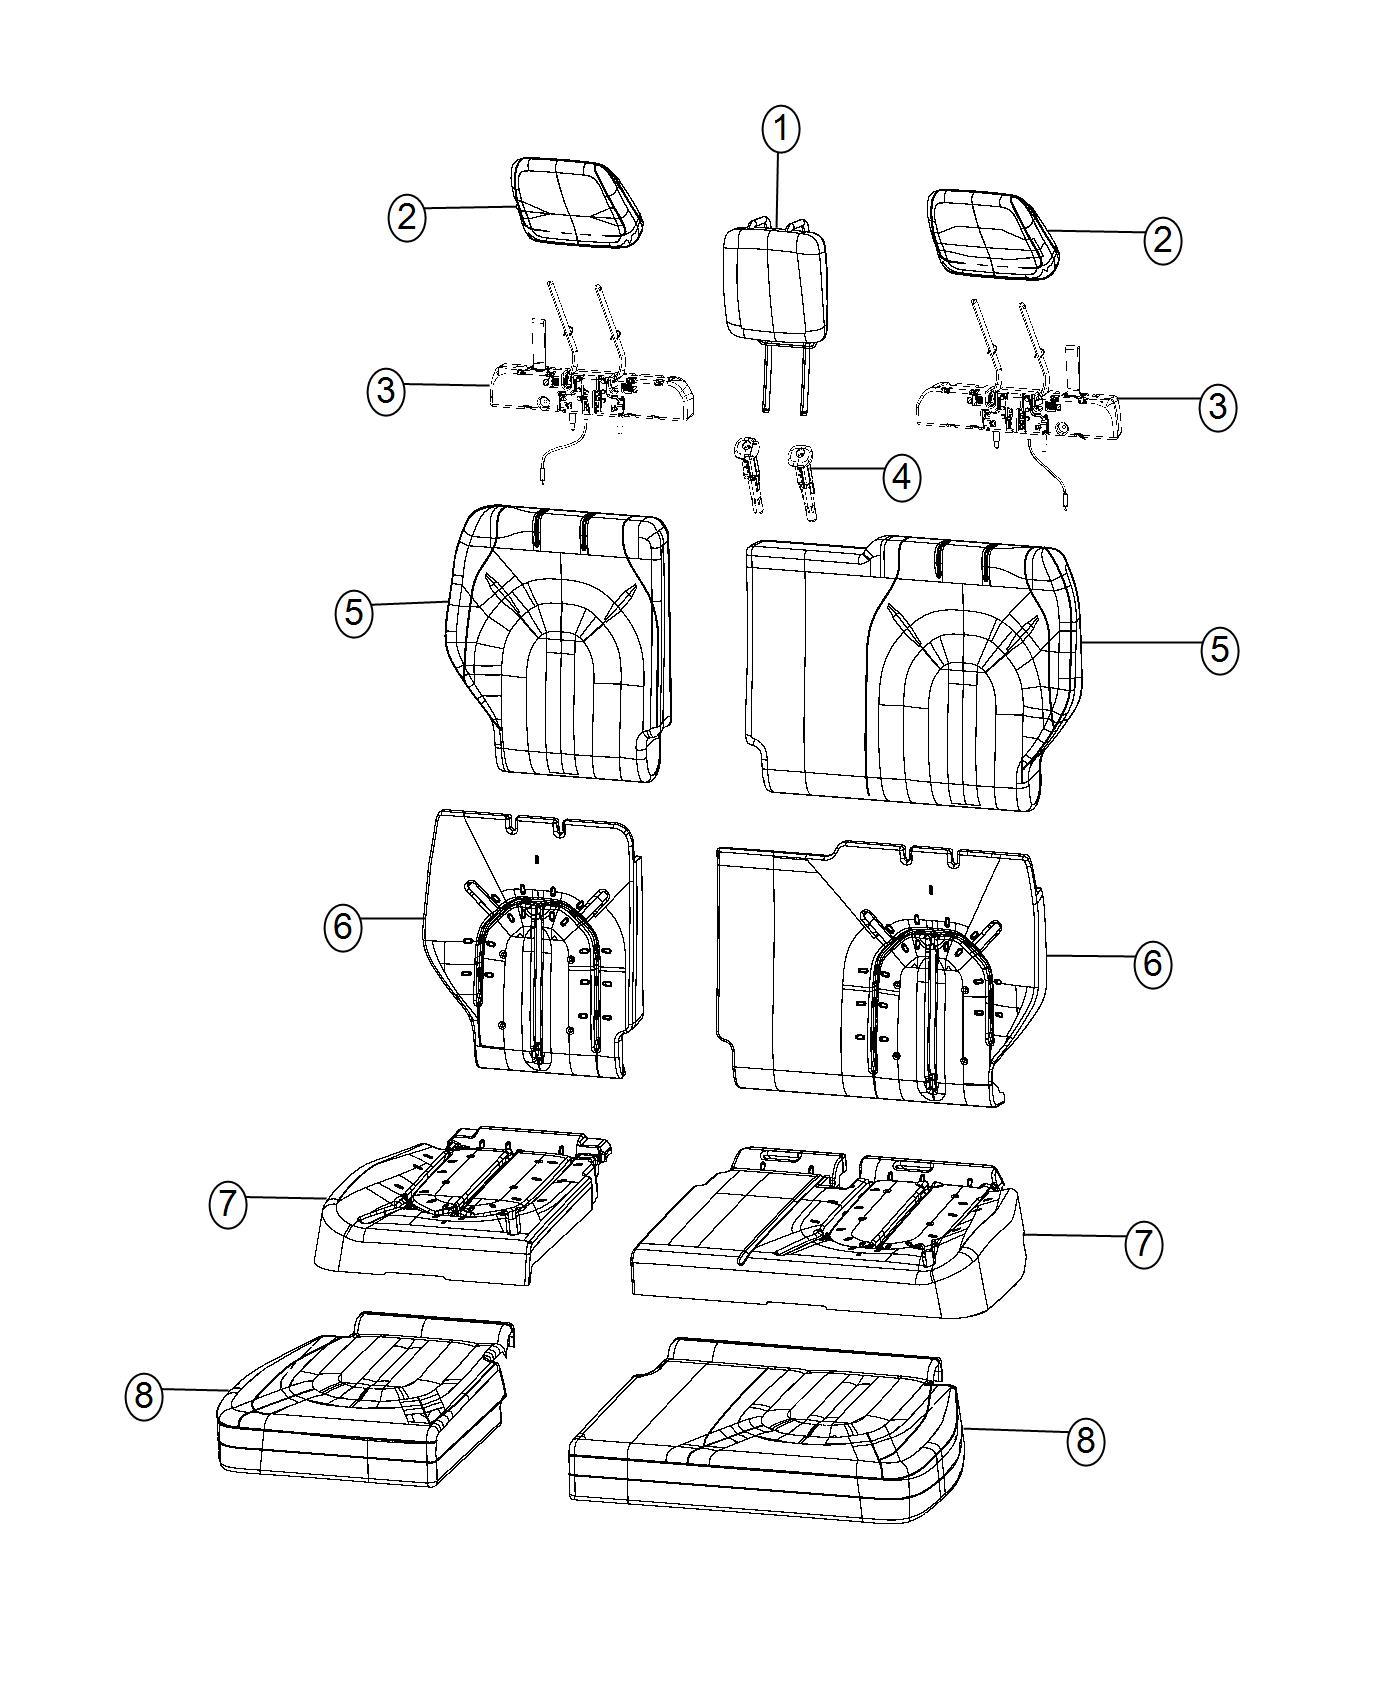 2017 Chrysler Pacifica Mechanism. Headrest folding. Left